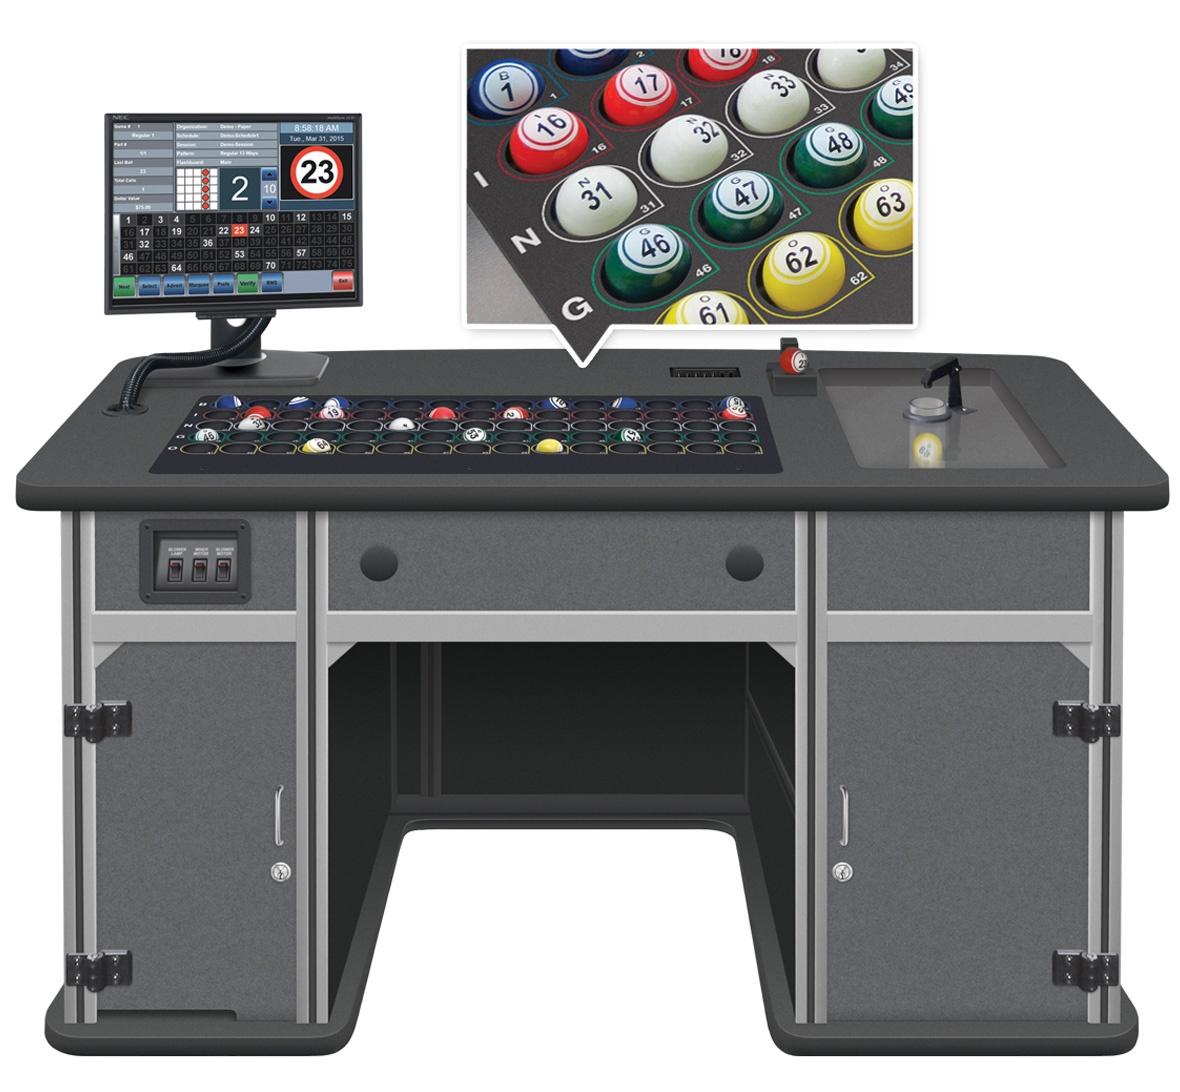 Statesman Premier Bingo Console with Color Code Ball Tray